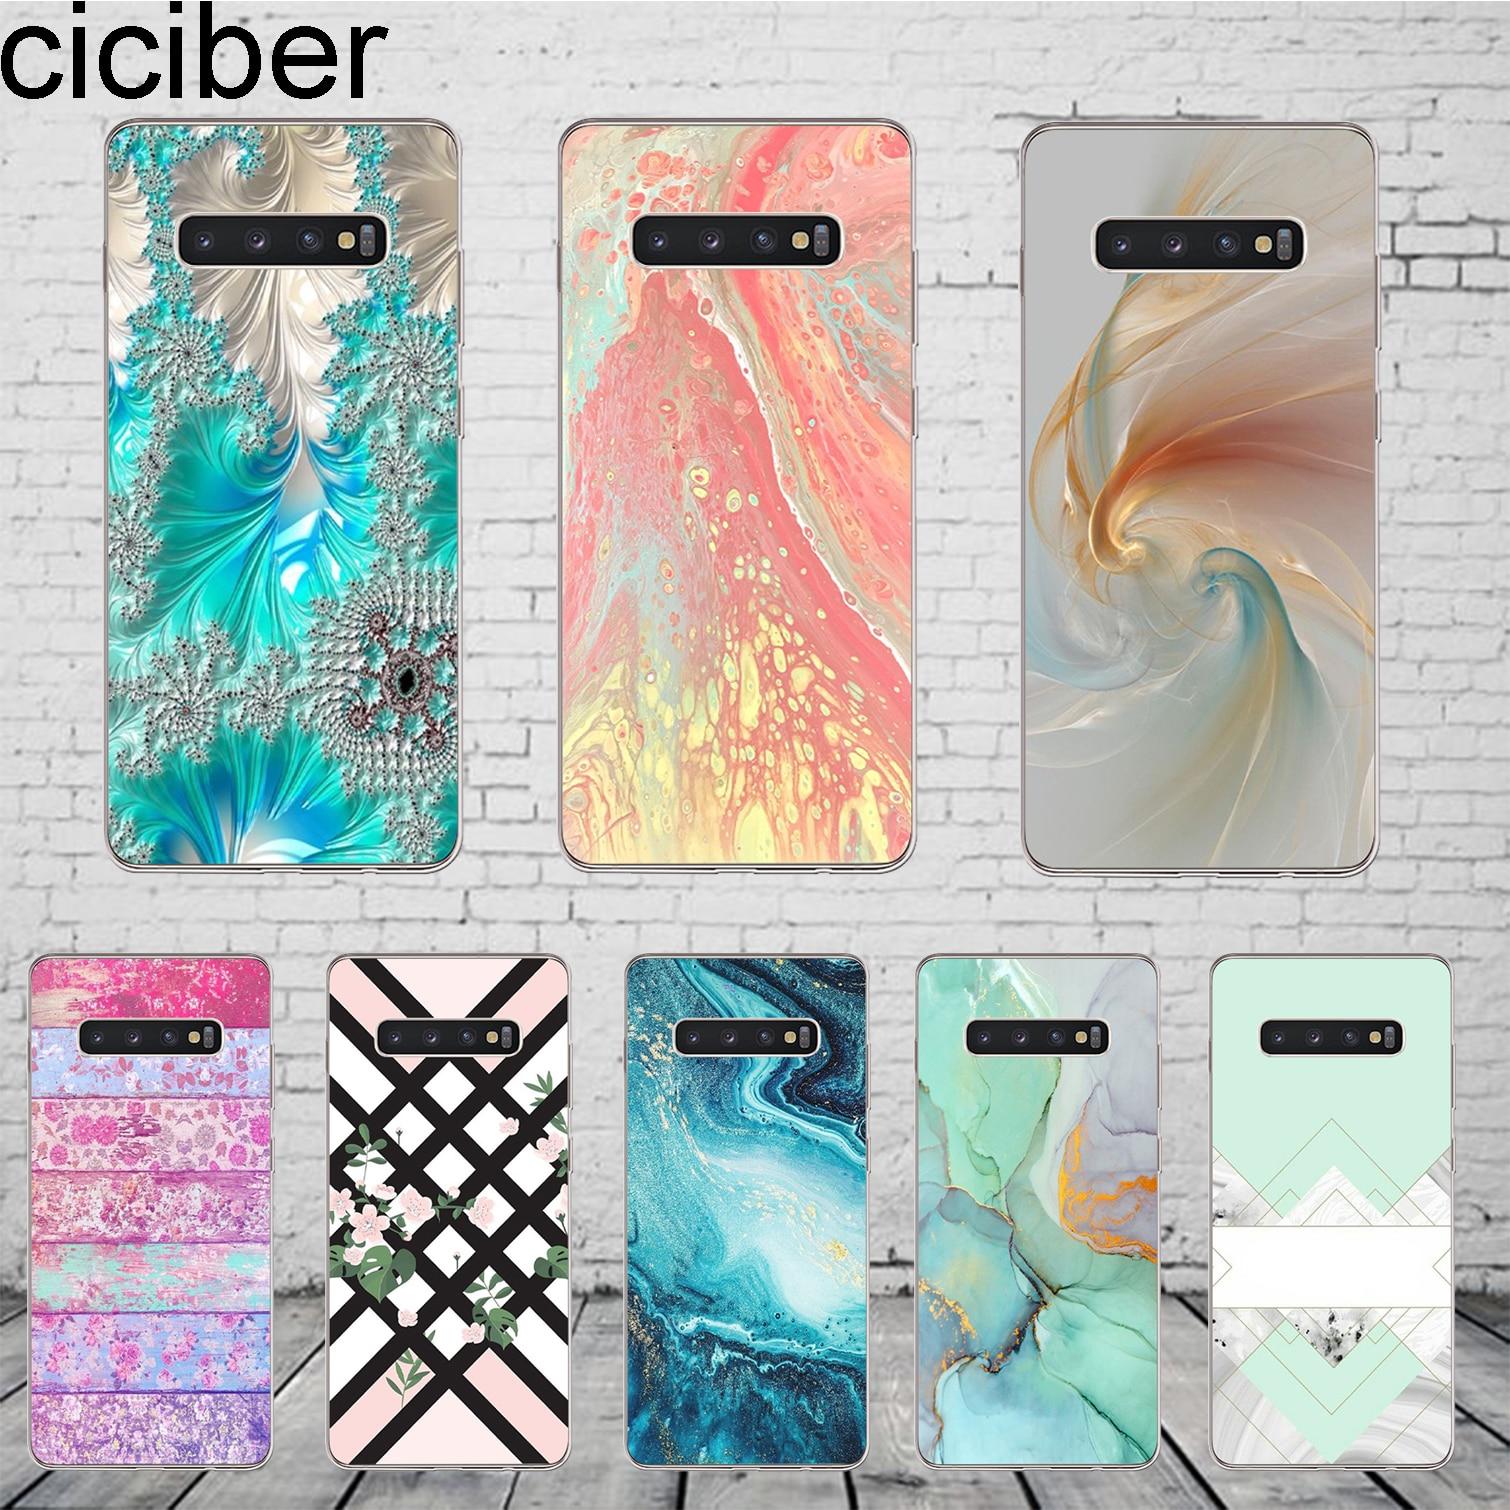 ciciber Fashion Marble Cover For Samsung Galaxy S9 S8 S5 S7 S6 S10+ S10e Lite Plus Edge mini Phone Case Soft TPU Shell Fundas